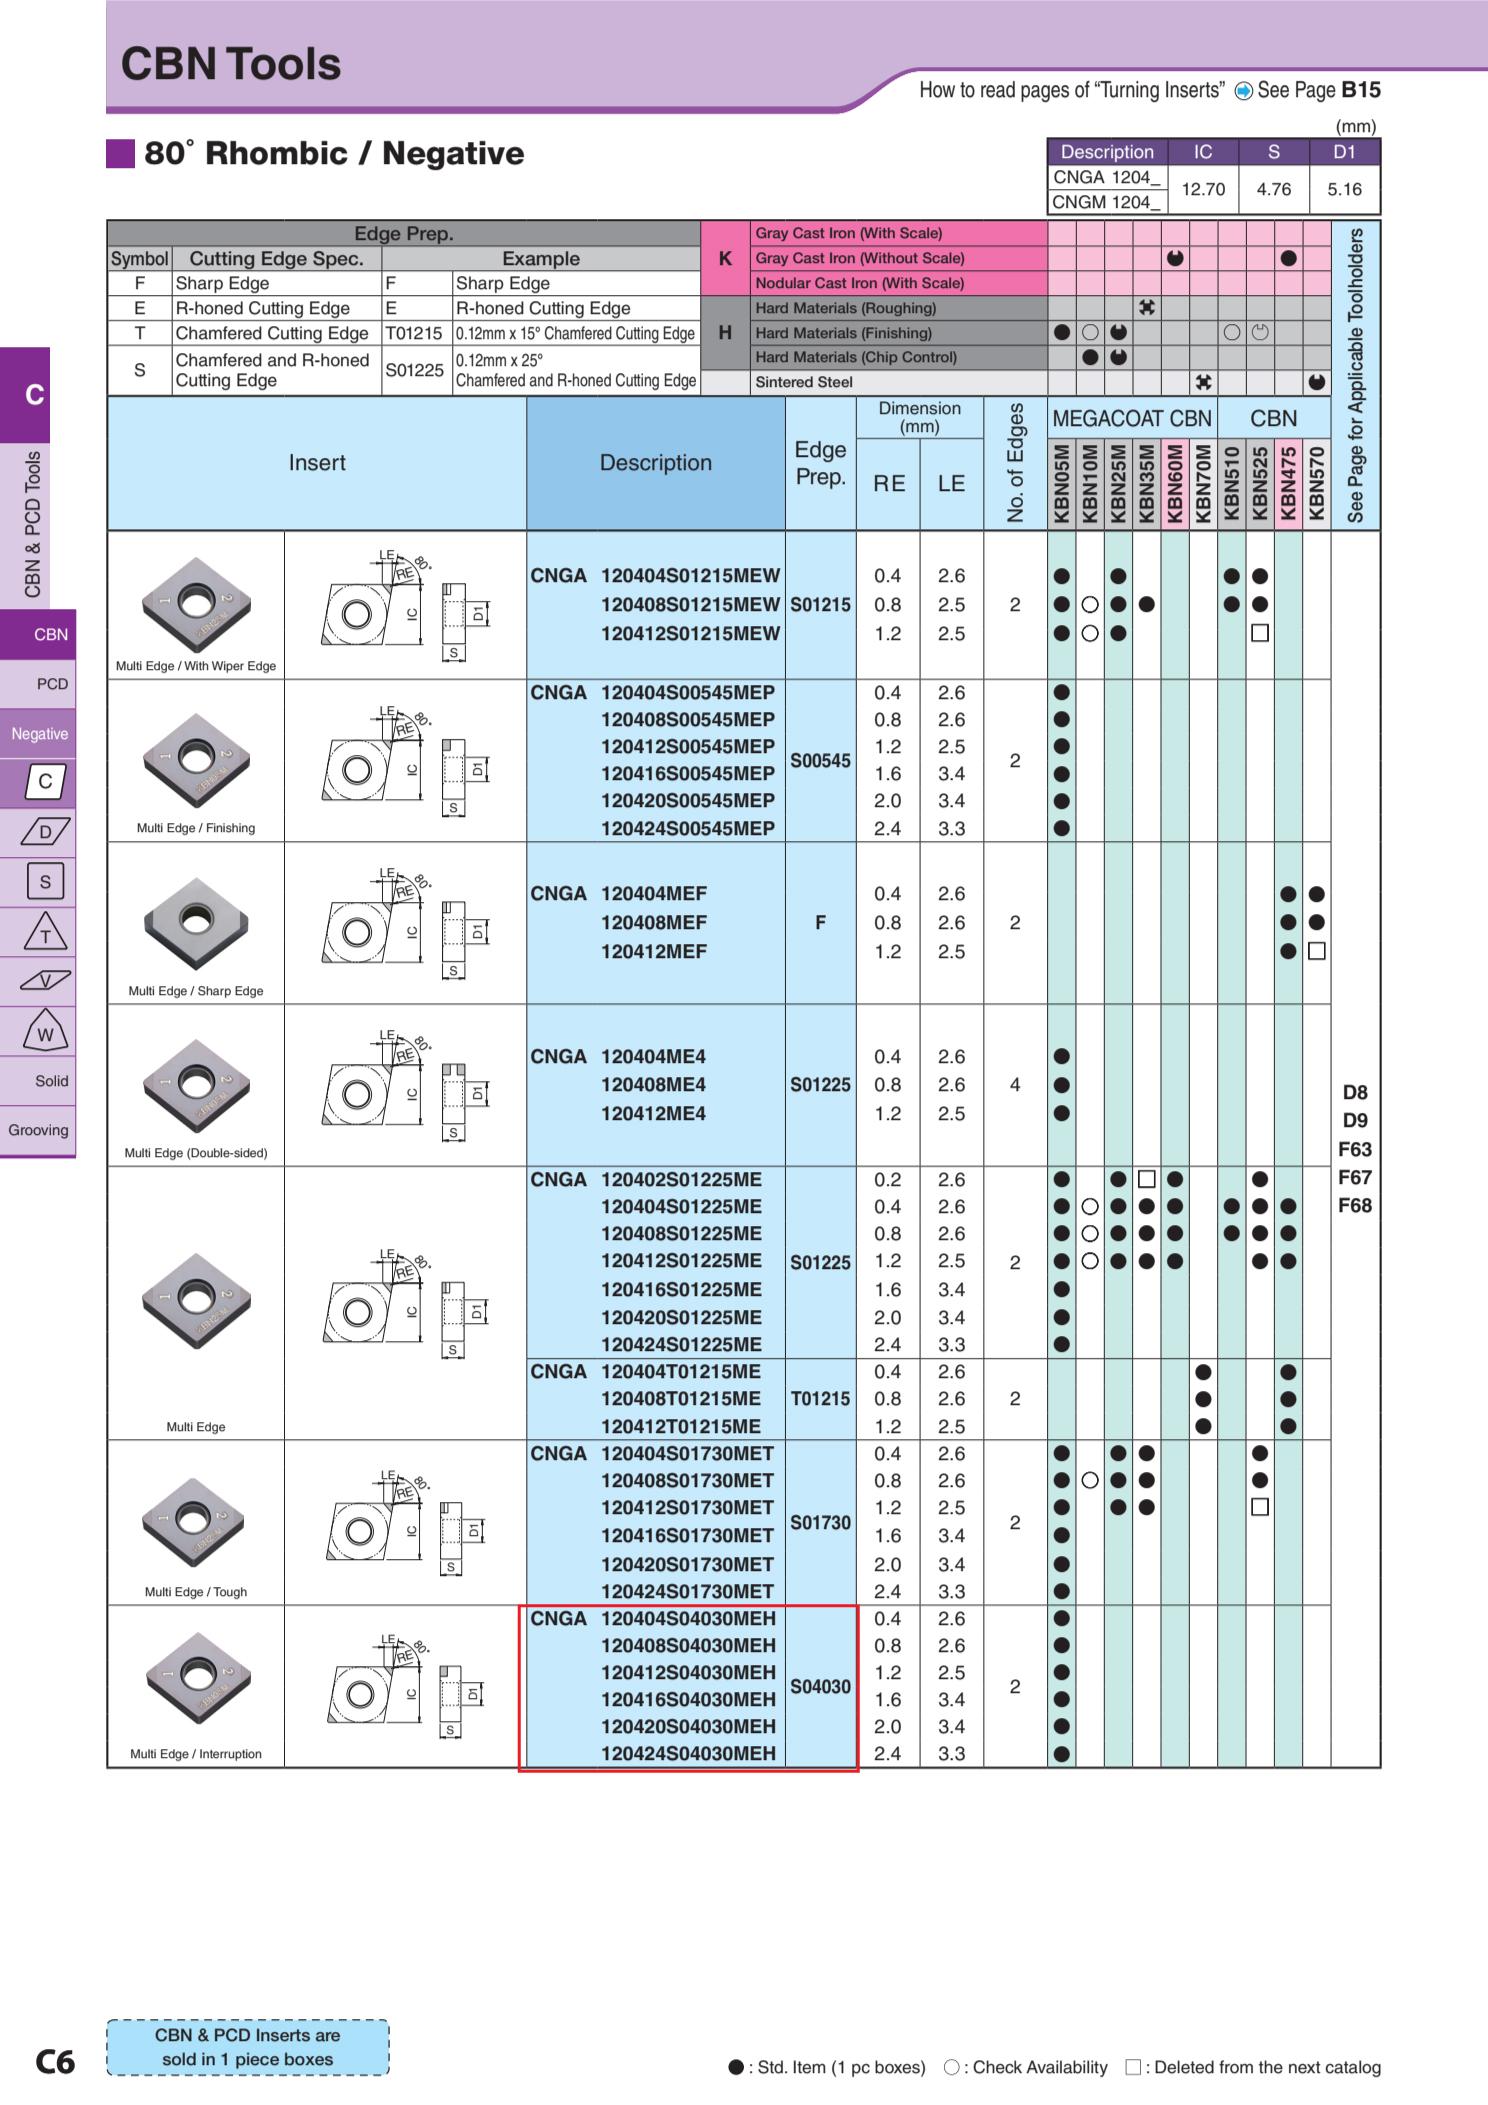 Mảnh Dao Tiện CBN Kyocera CNGA1204-S04030MEH 1